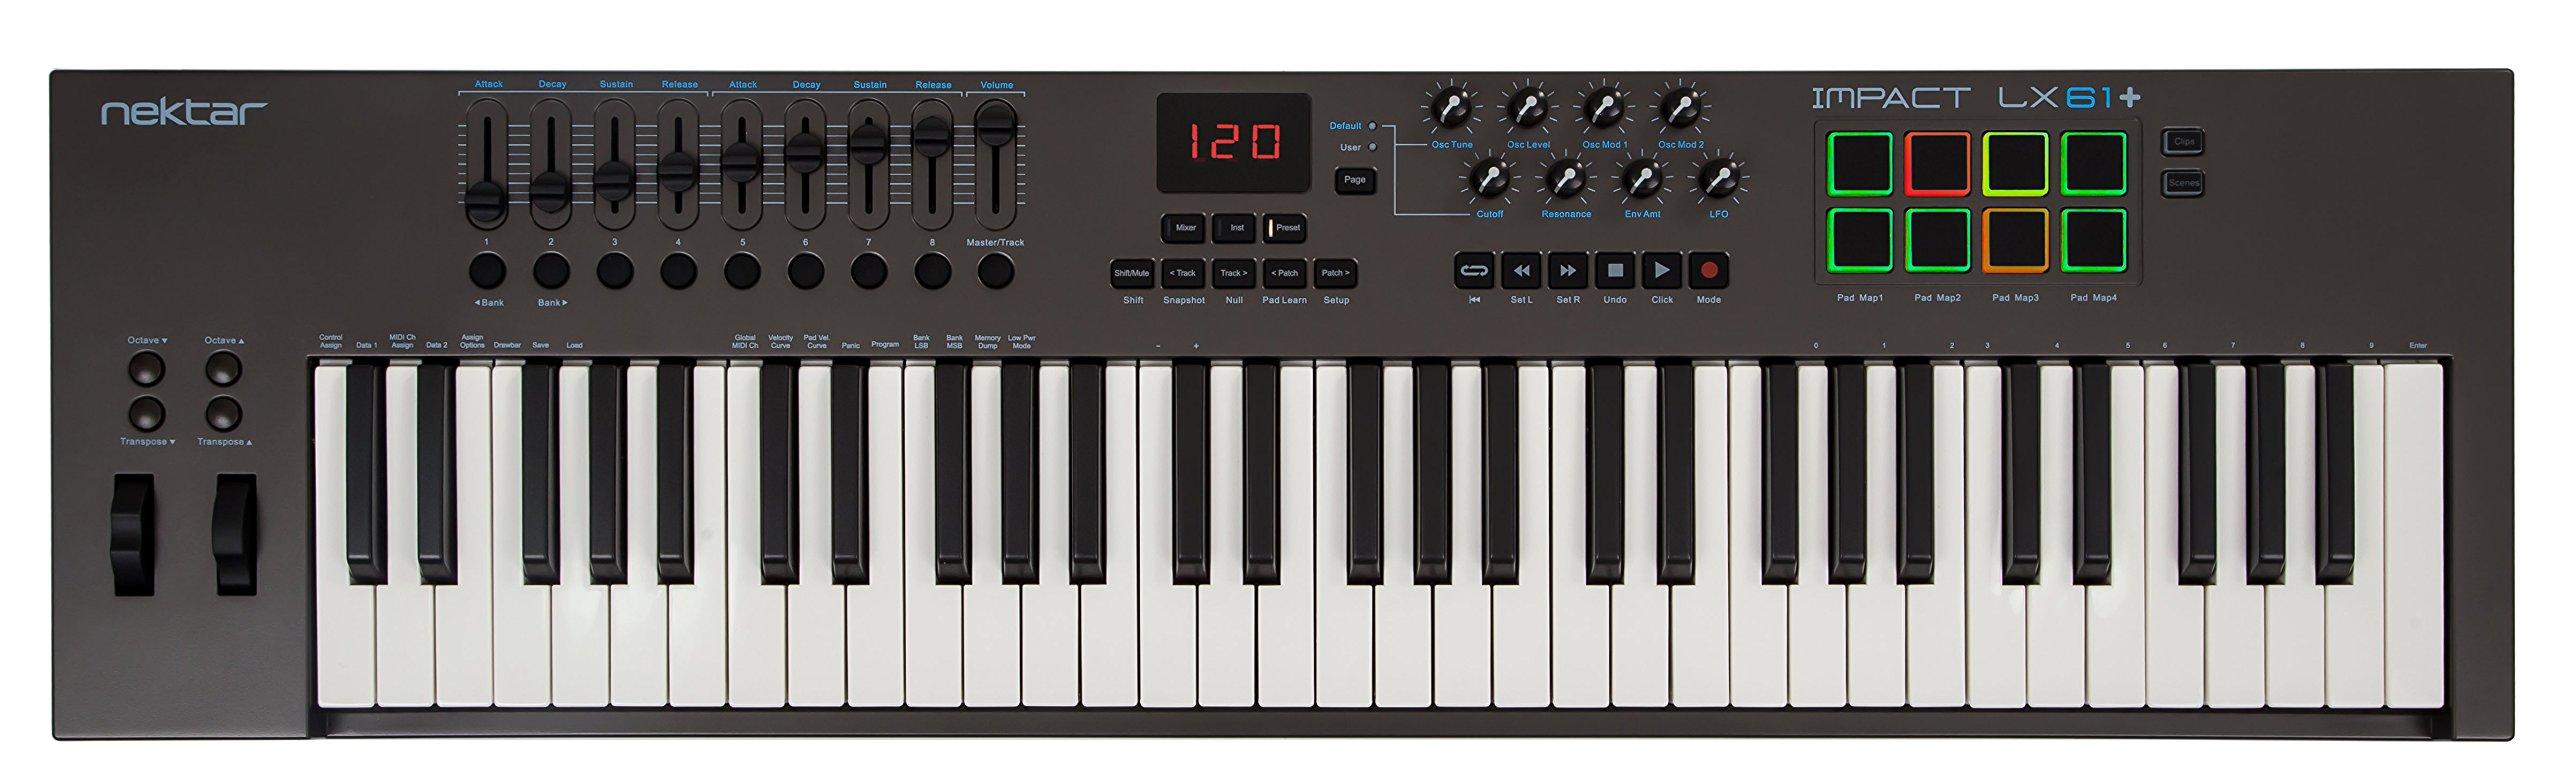 Nektar Impact LX61+ Keyboard Controller